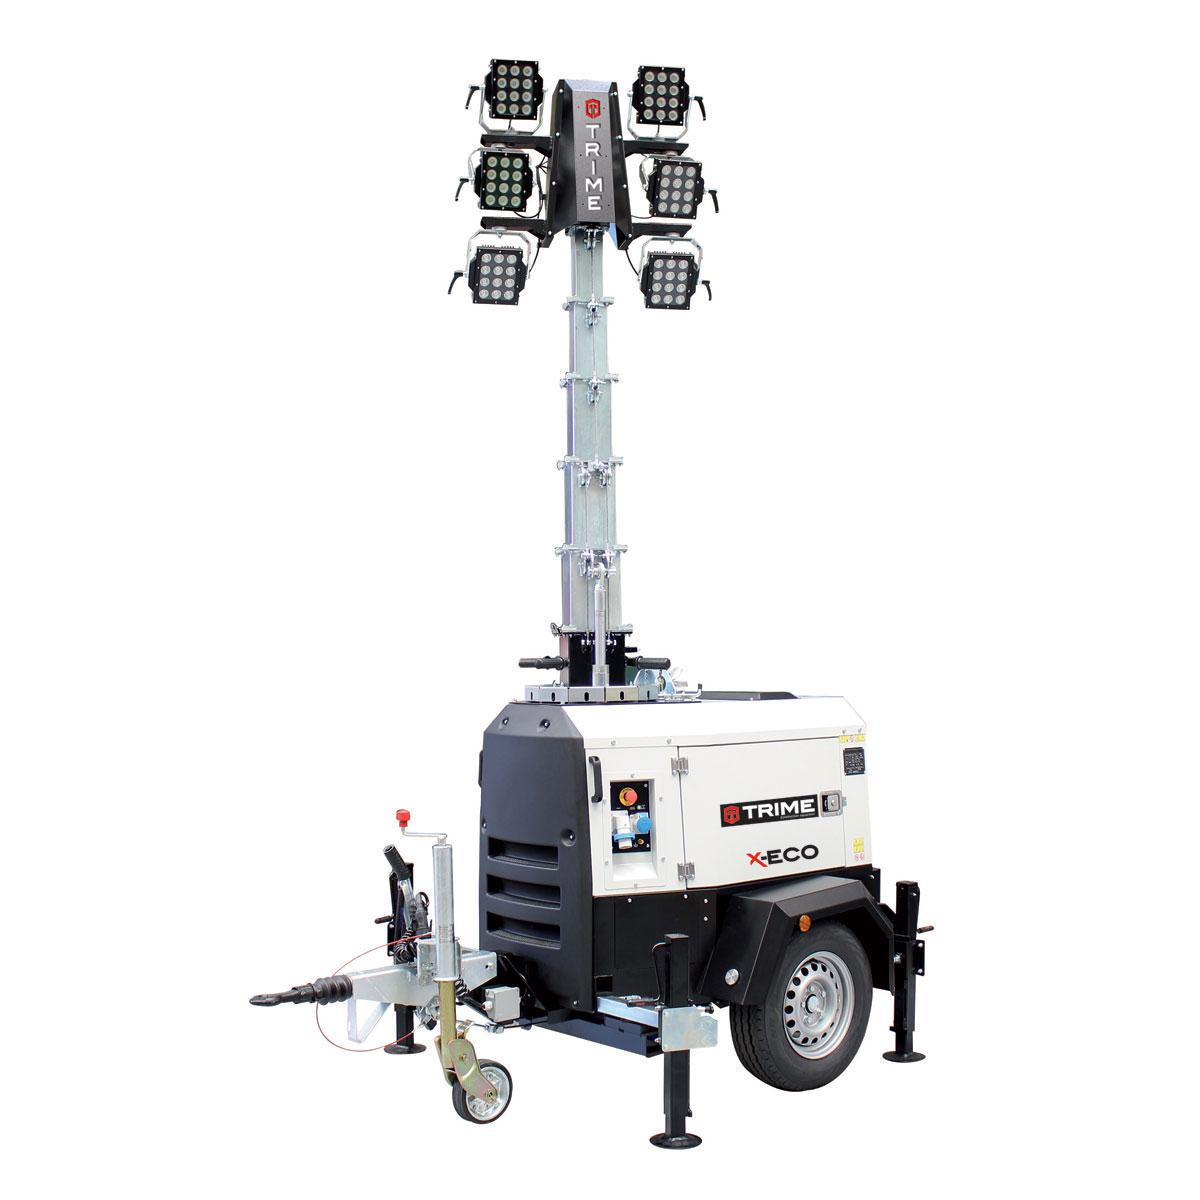 prozektoru-masts-led-x-eco-6x150W-48V-atverta-pozicija